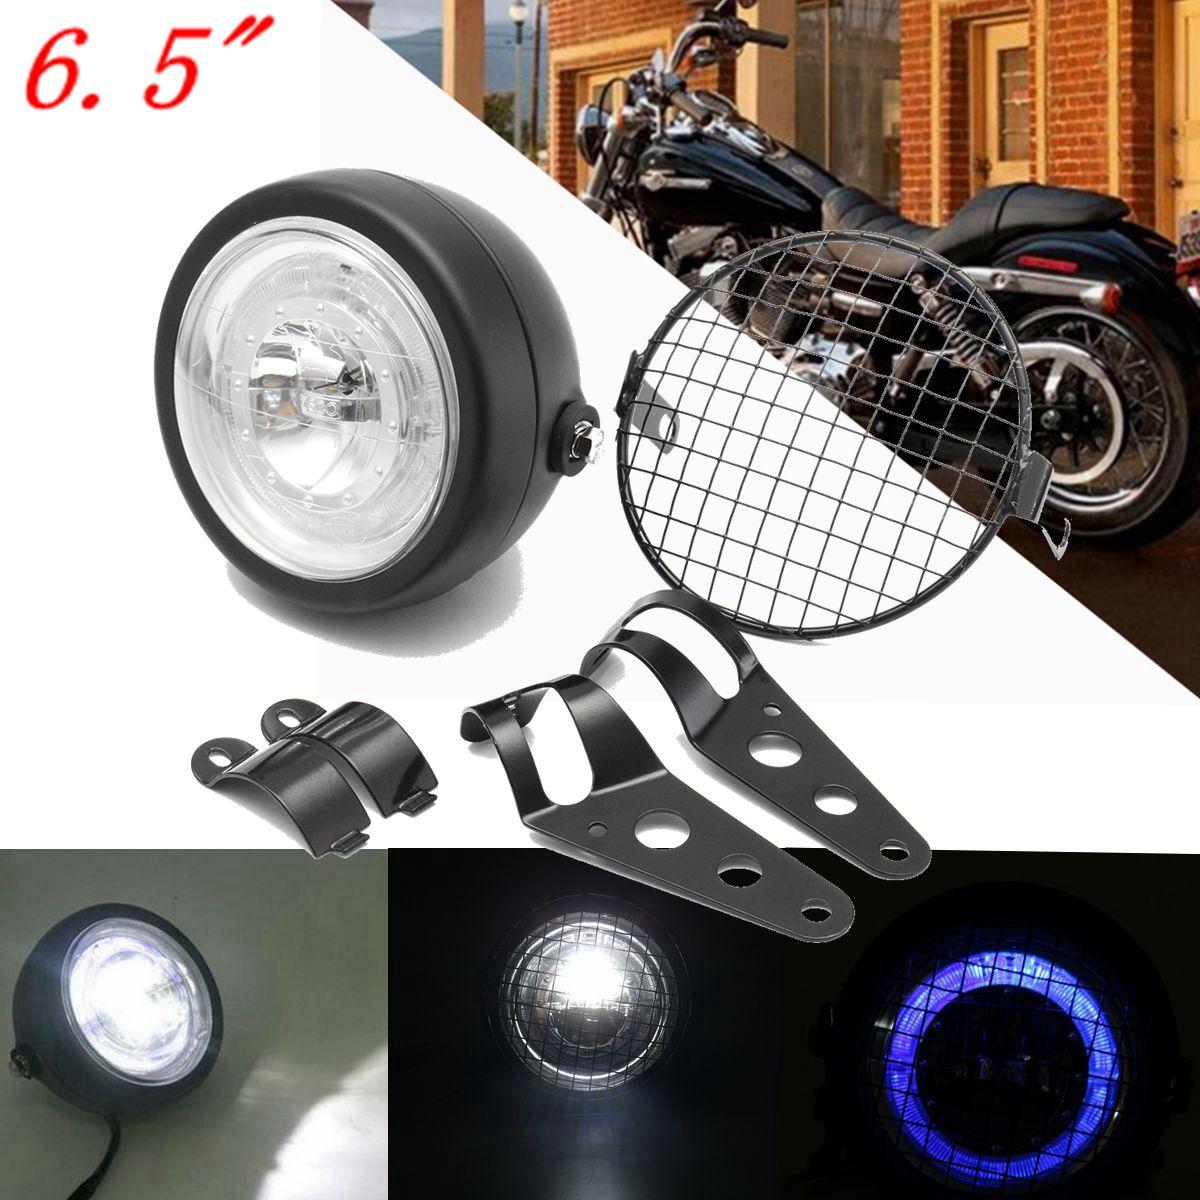 Universal 6.5 inch 12V Retro Motorcycle Headlight High/Low Beam Headlamp Grill Side Grille Mount Cover W/ Bracket Cafe Racer xuankun motorcycle lf150 10s kpr150 original headlamp bracket combination